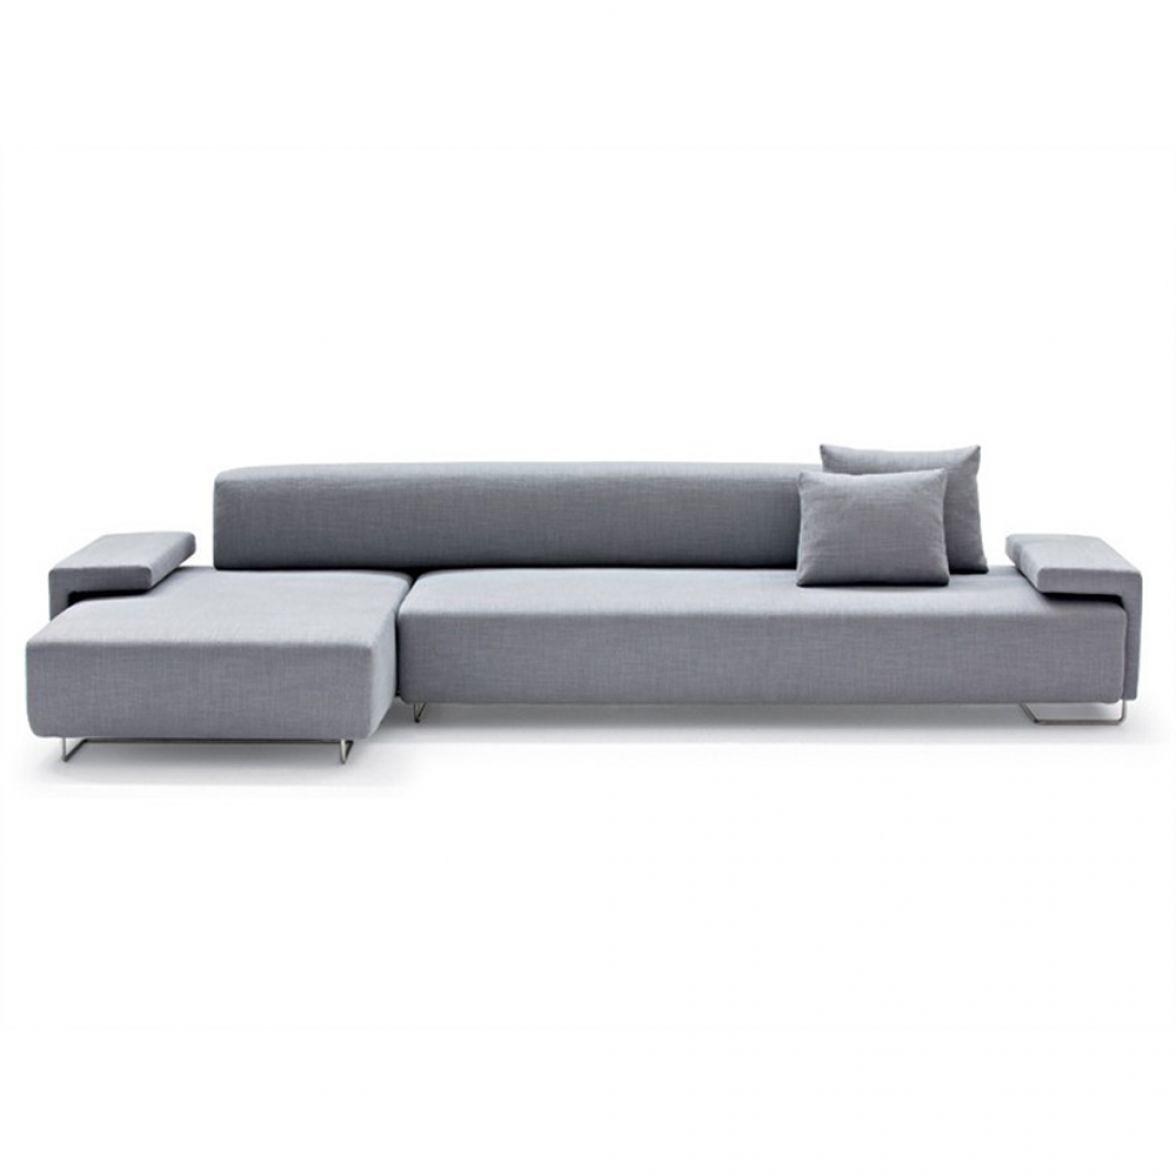 Lowland sofa фото цена